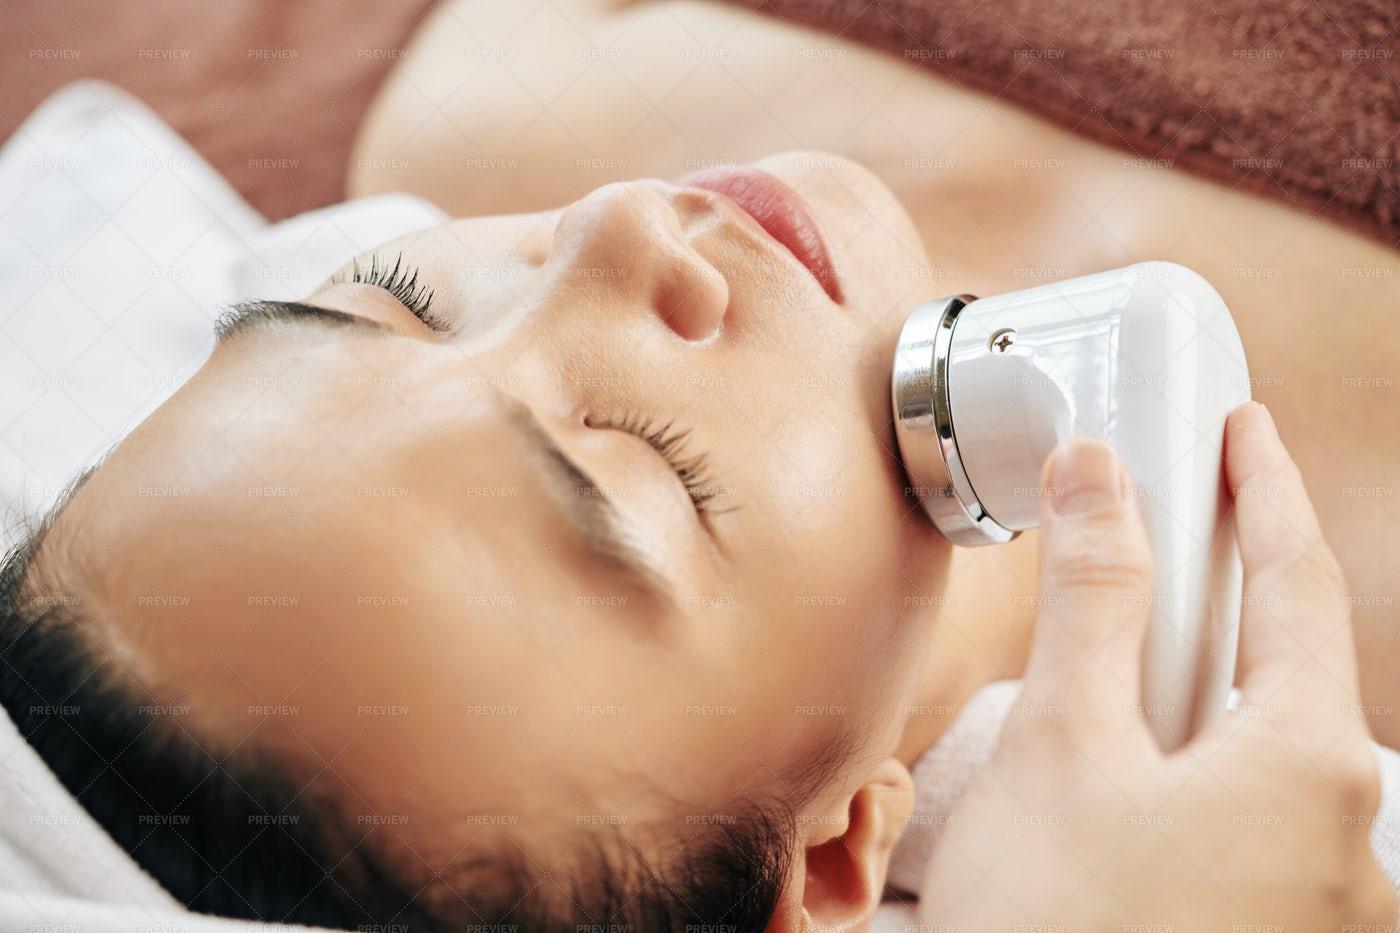 Untrasound Massage With Apparatus: Stock Photos